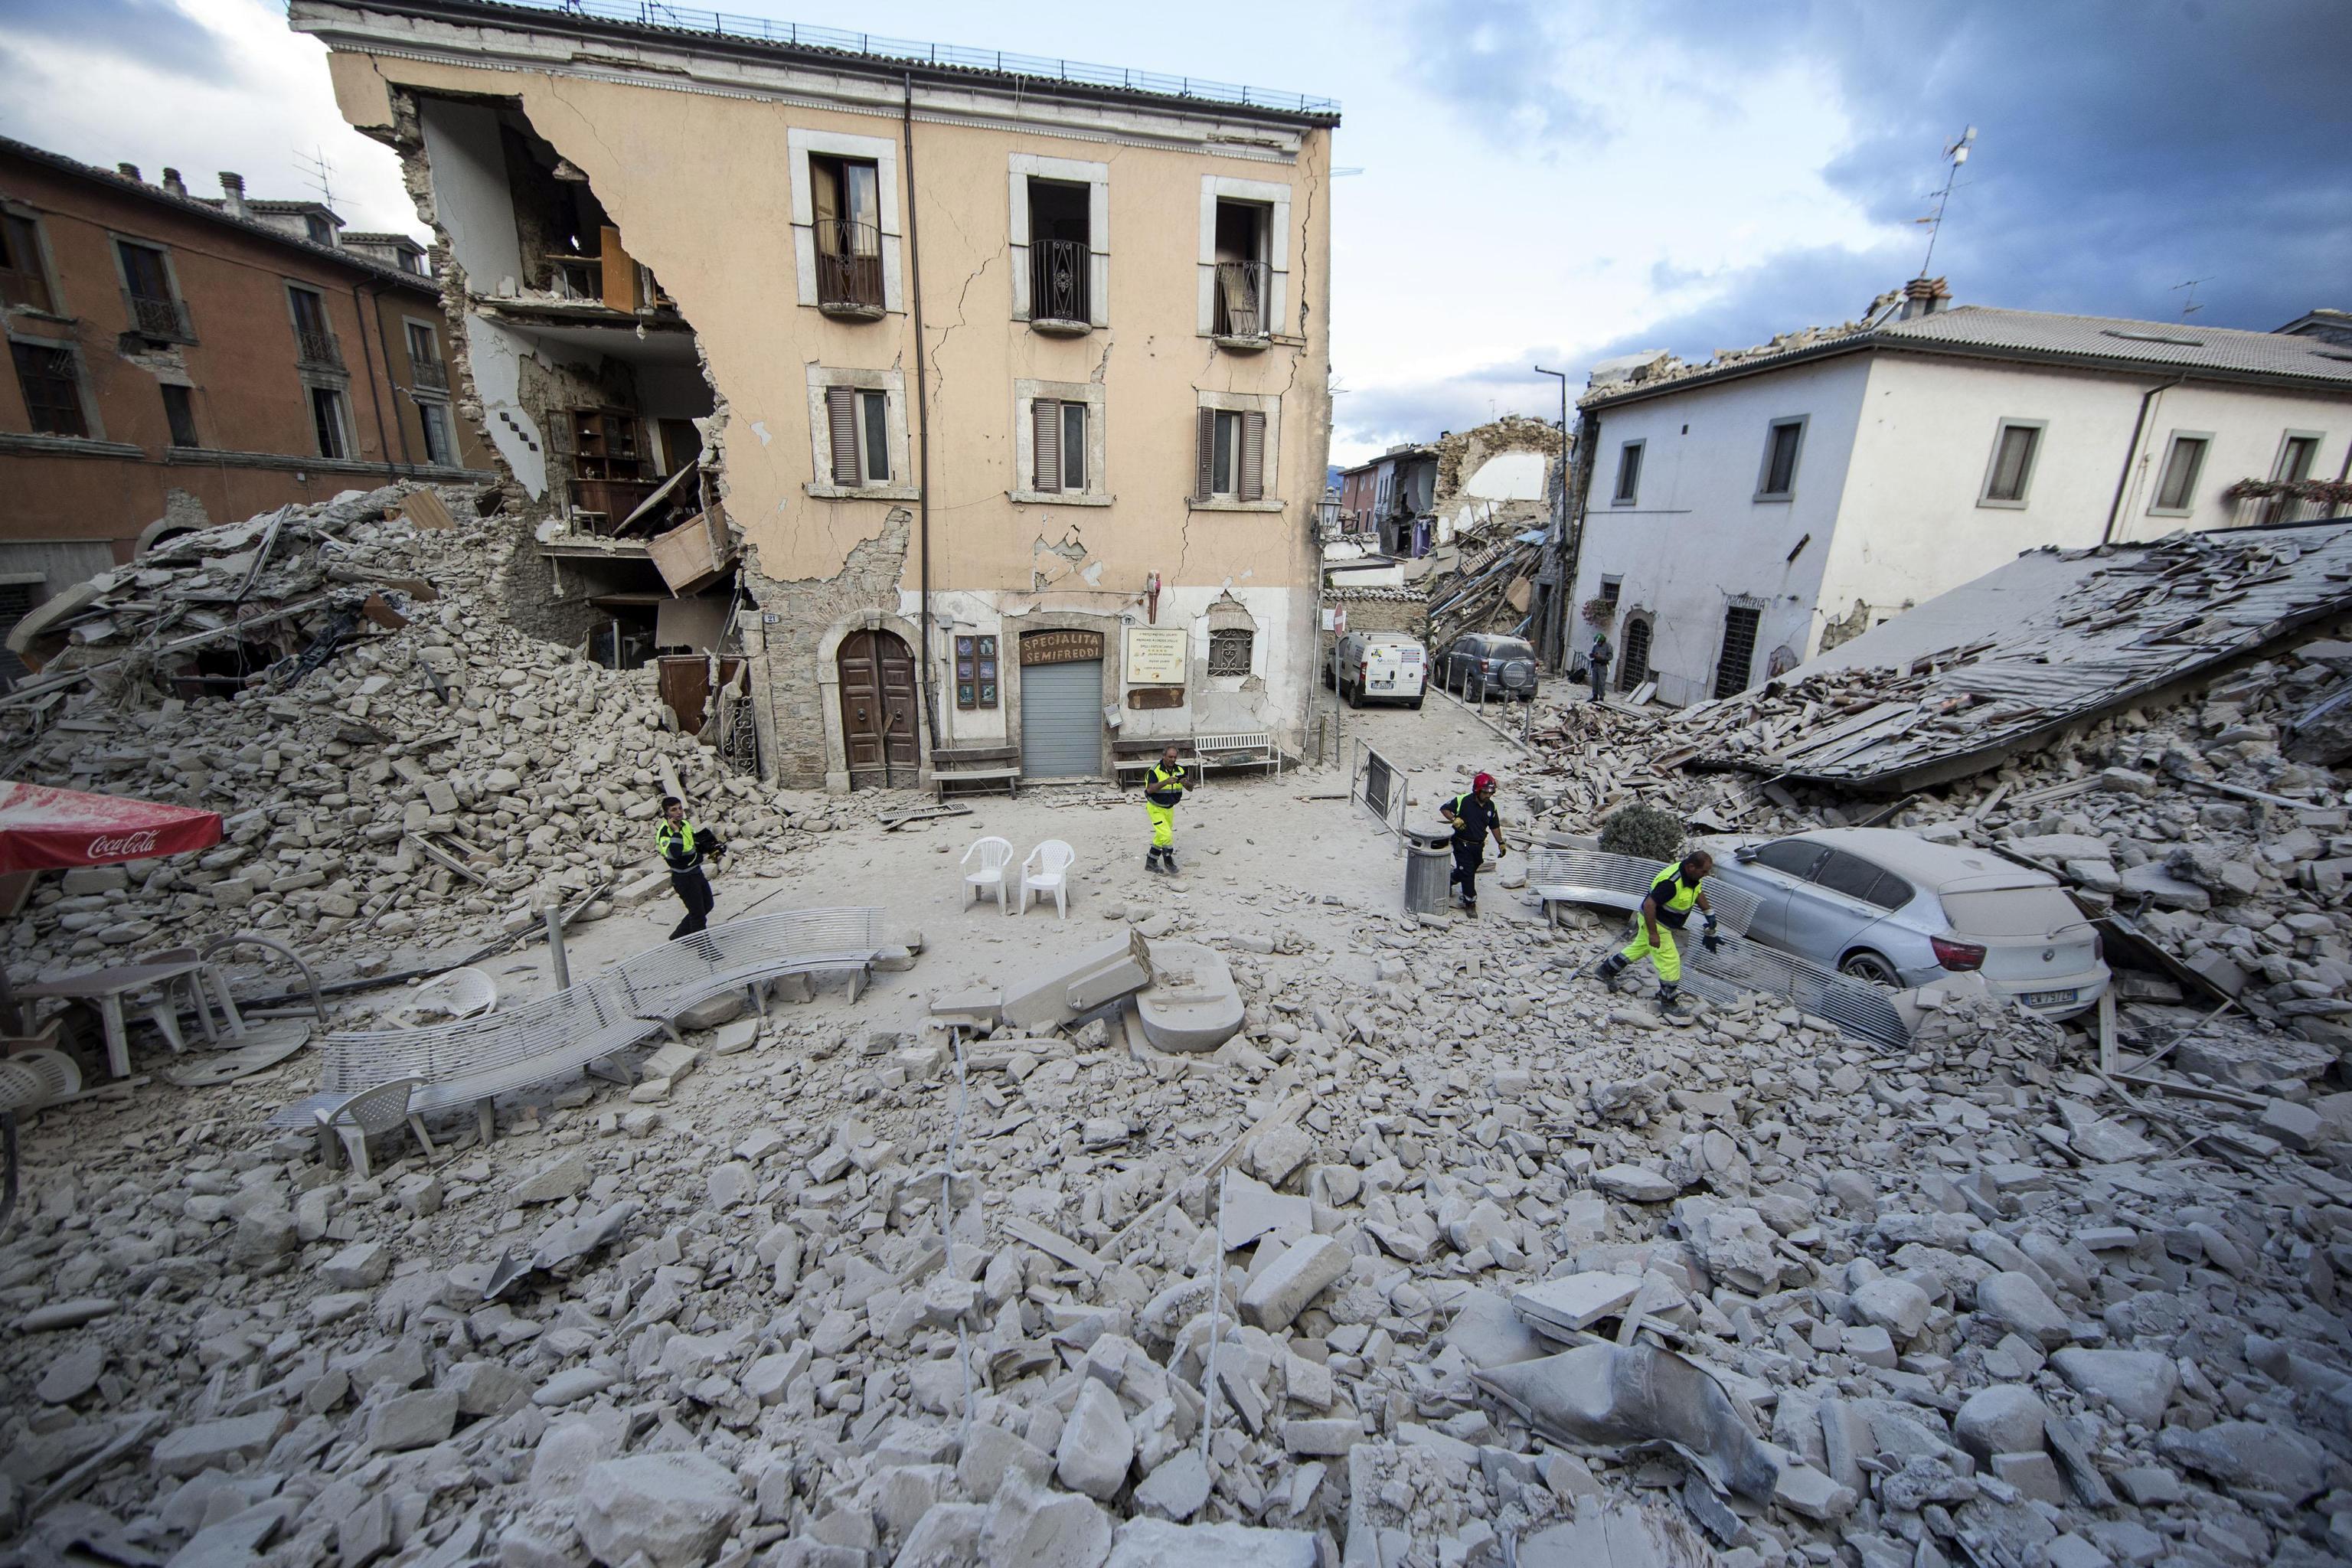 Terremoto in Centro Italia, Abi: